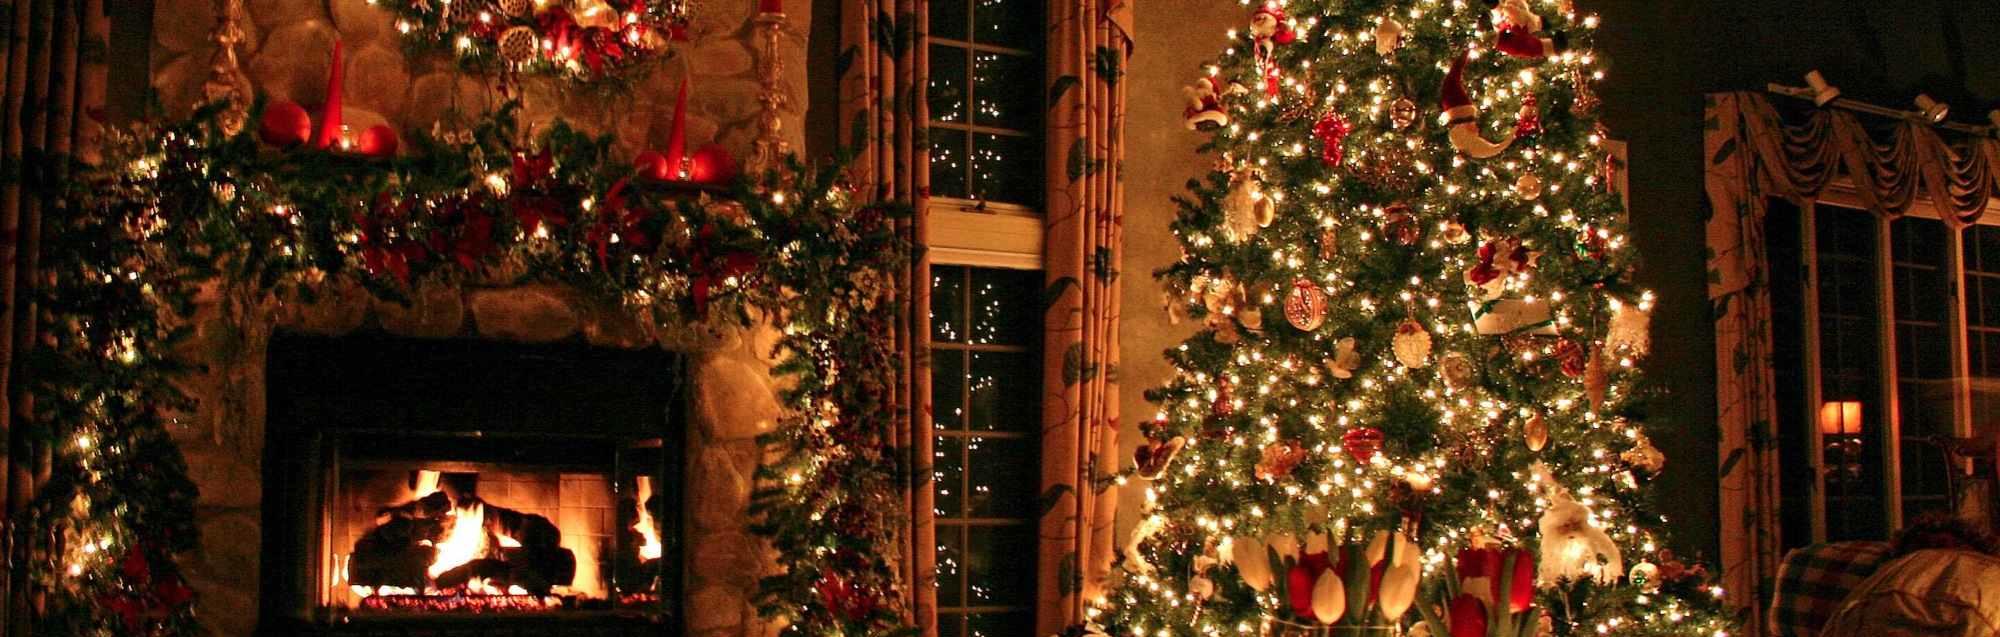 Twelve Digital Marketing Tips Of Christmas